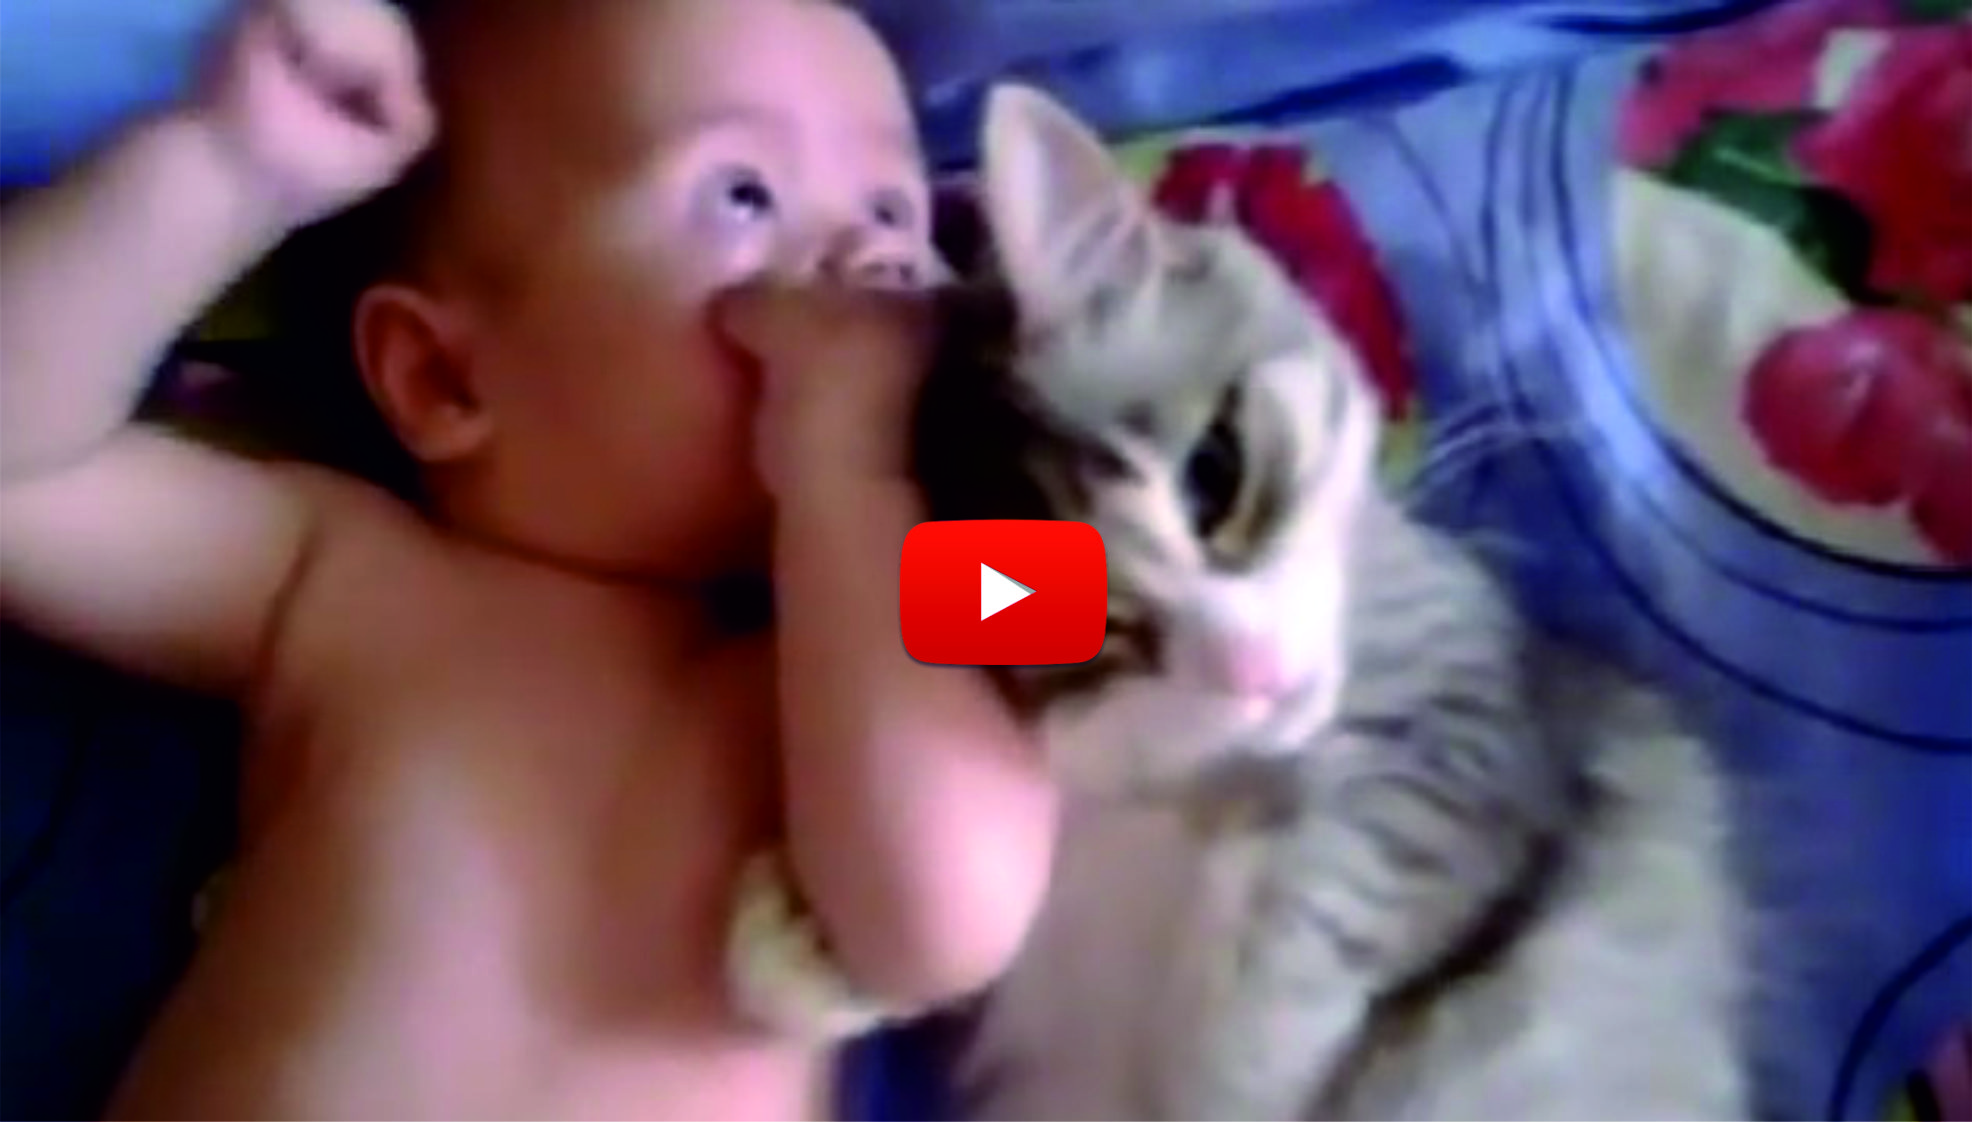 БЕЗУМНО сладко коте и бебе! Погледнете ги само – това се казва любов и нежност! (ВИДЕО)